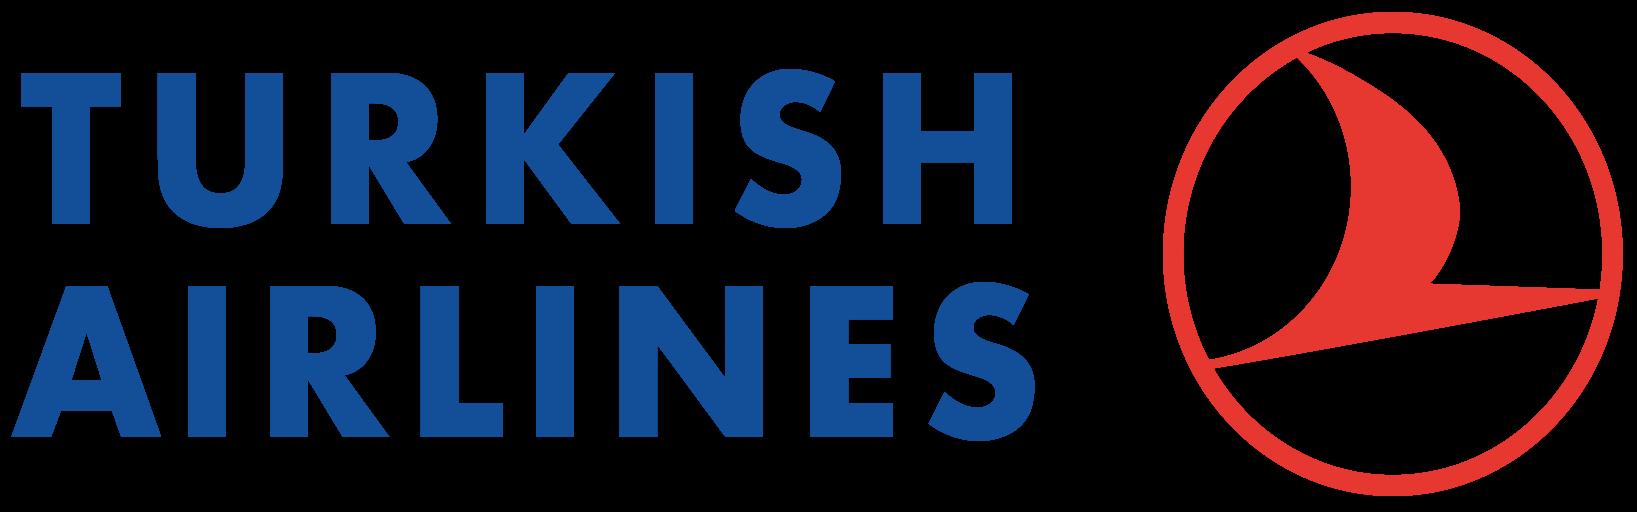 Turkish Airlines_Isologotype